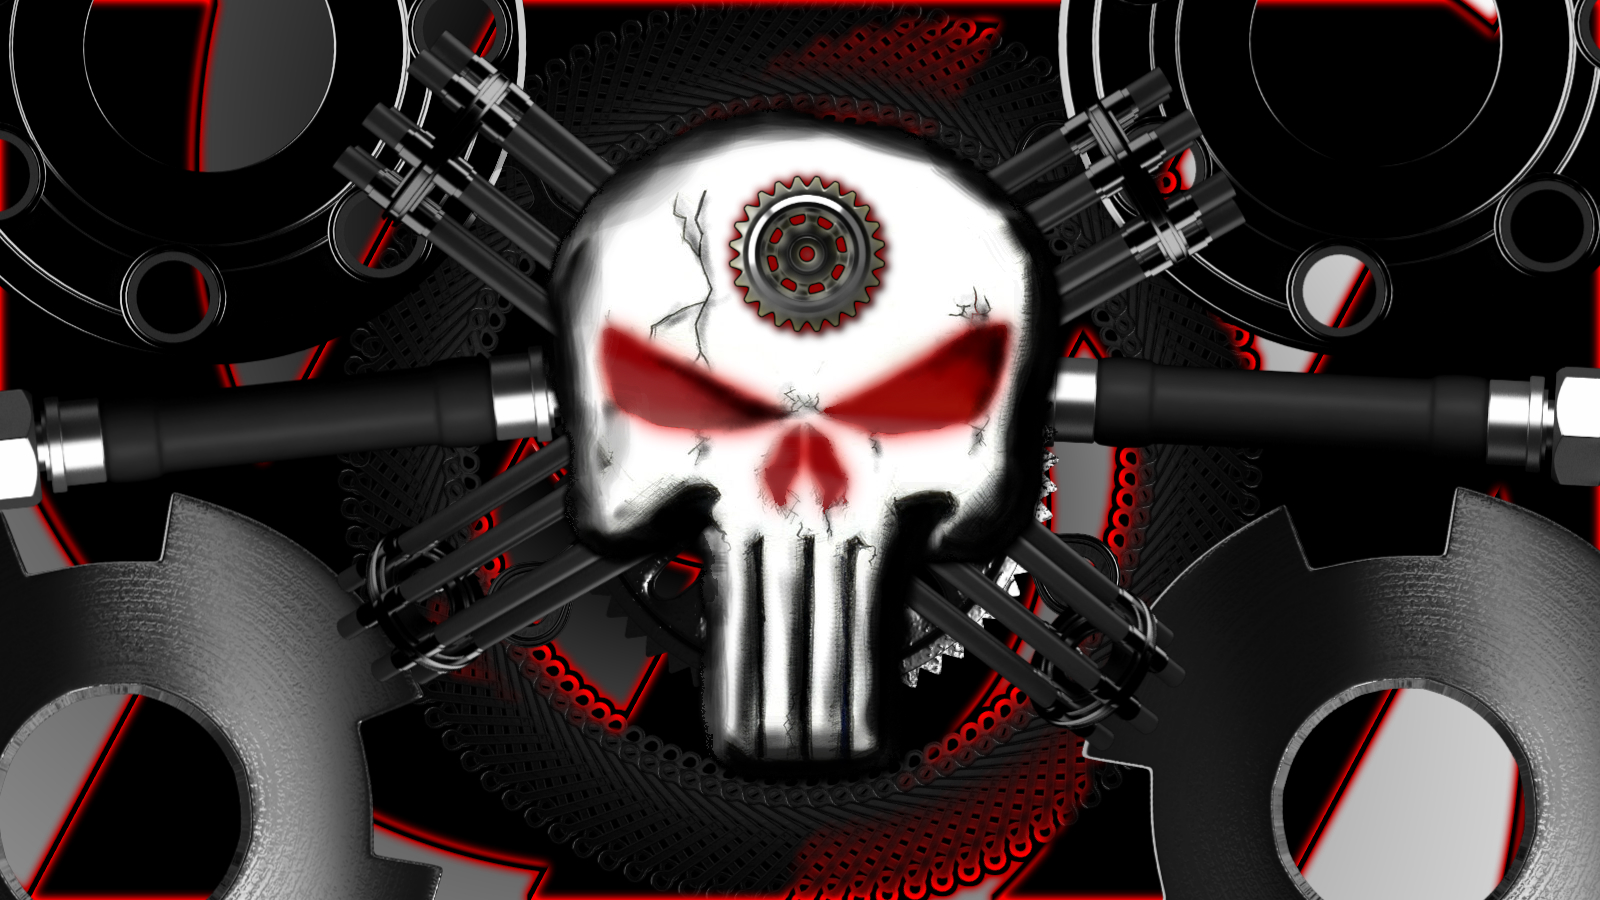 Steam Punk Punisher Logo Computer Wallpapers, Desktop ...